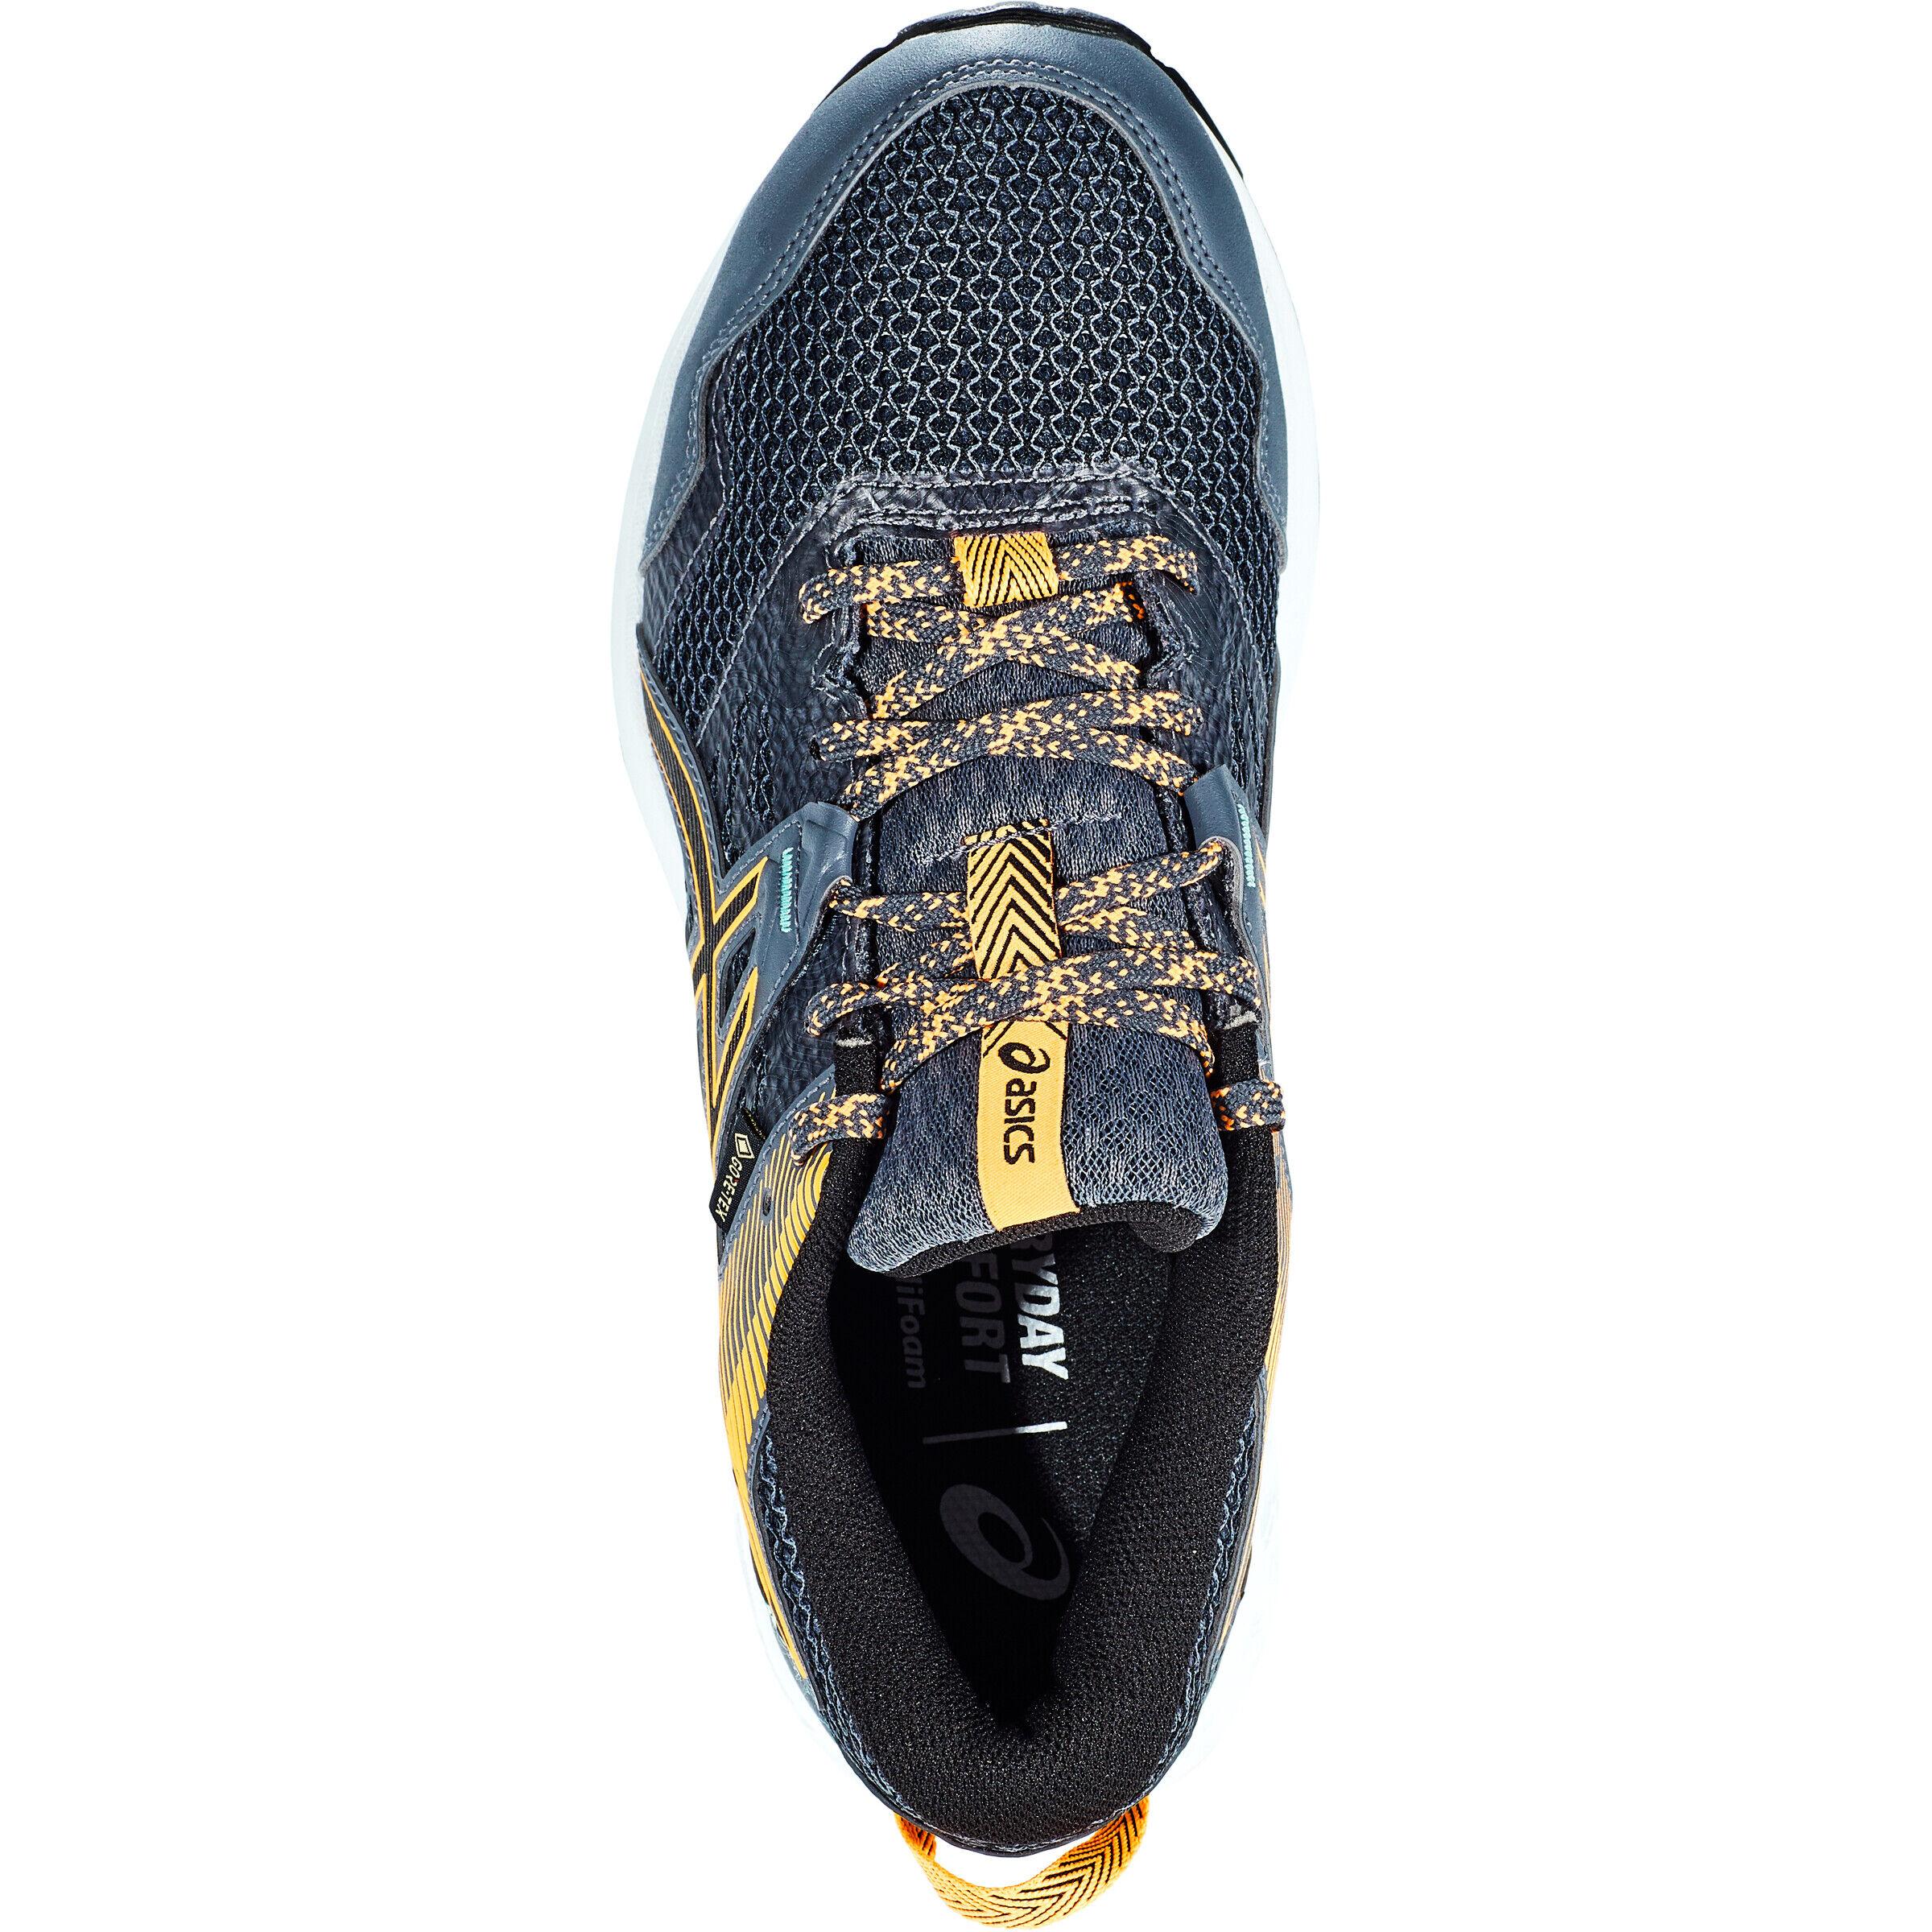 asics Gel Sonoma 5 G TX Schuhe Damen metropolisblack